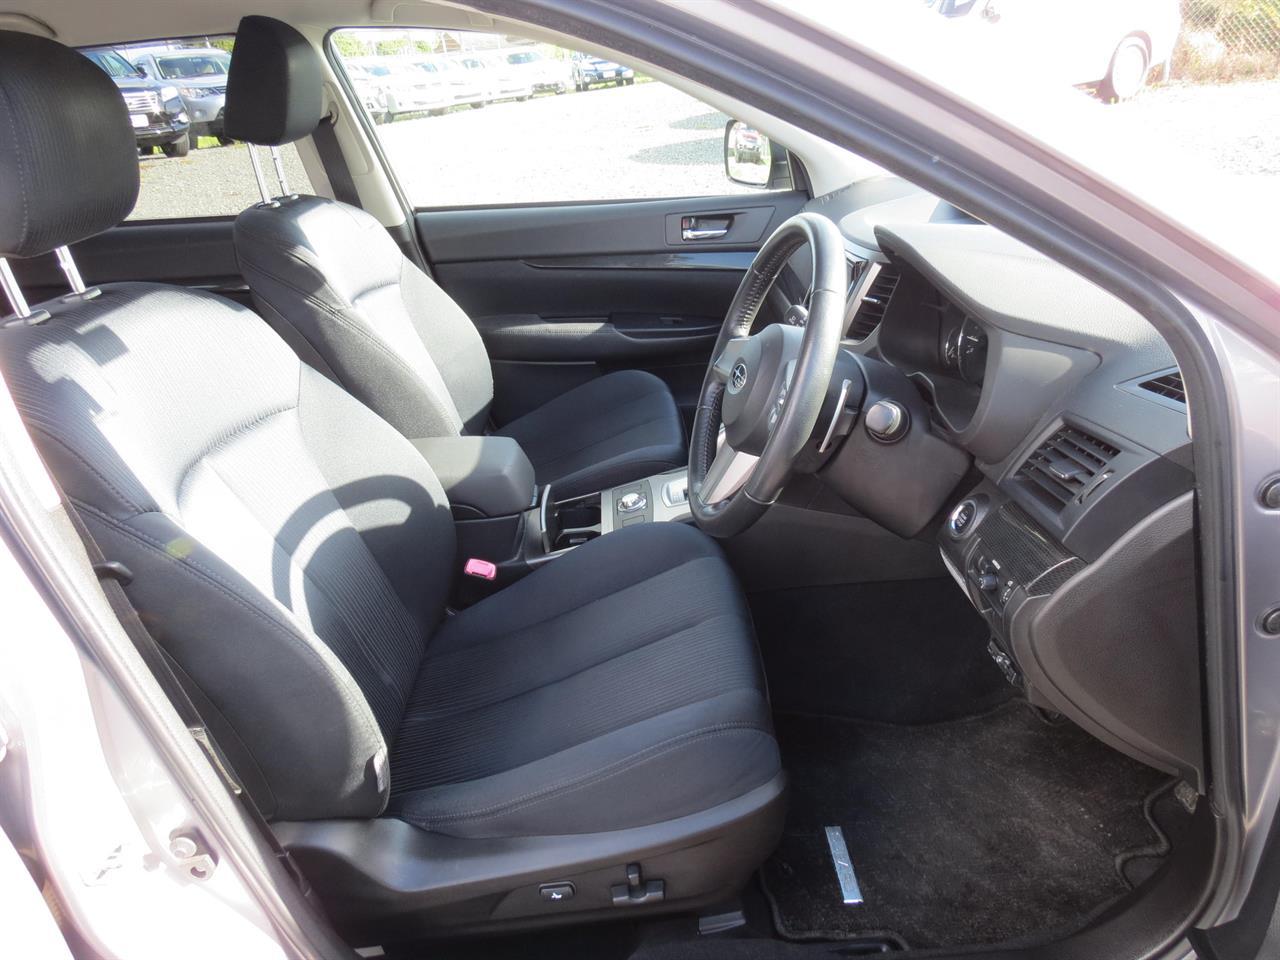 2011 Subaru Legacy | only $38 weekly